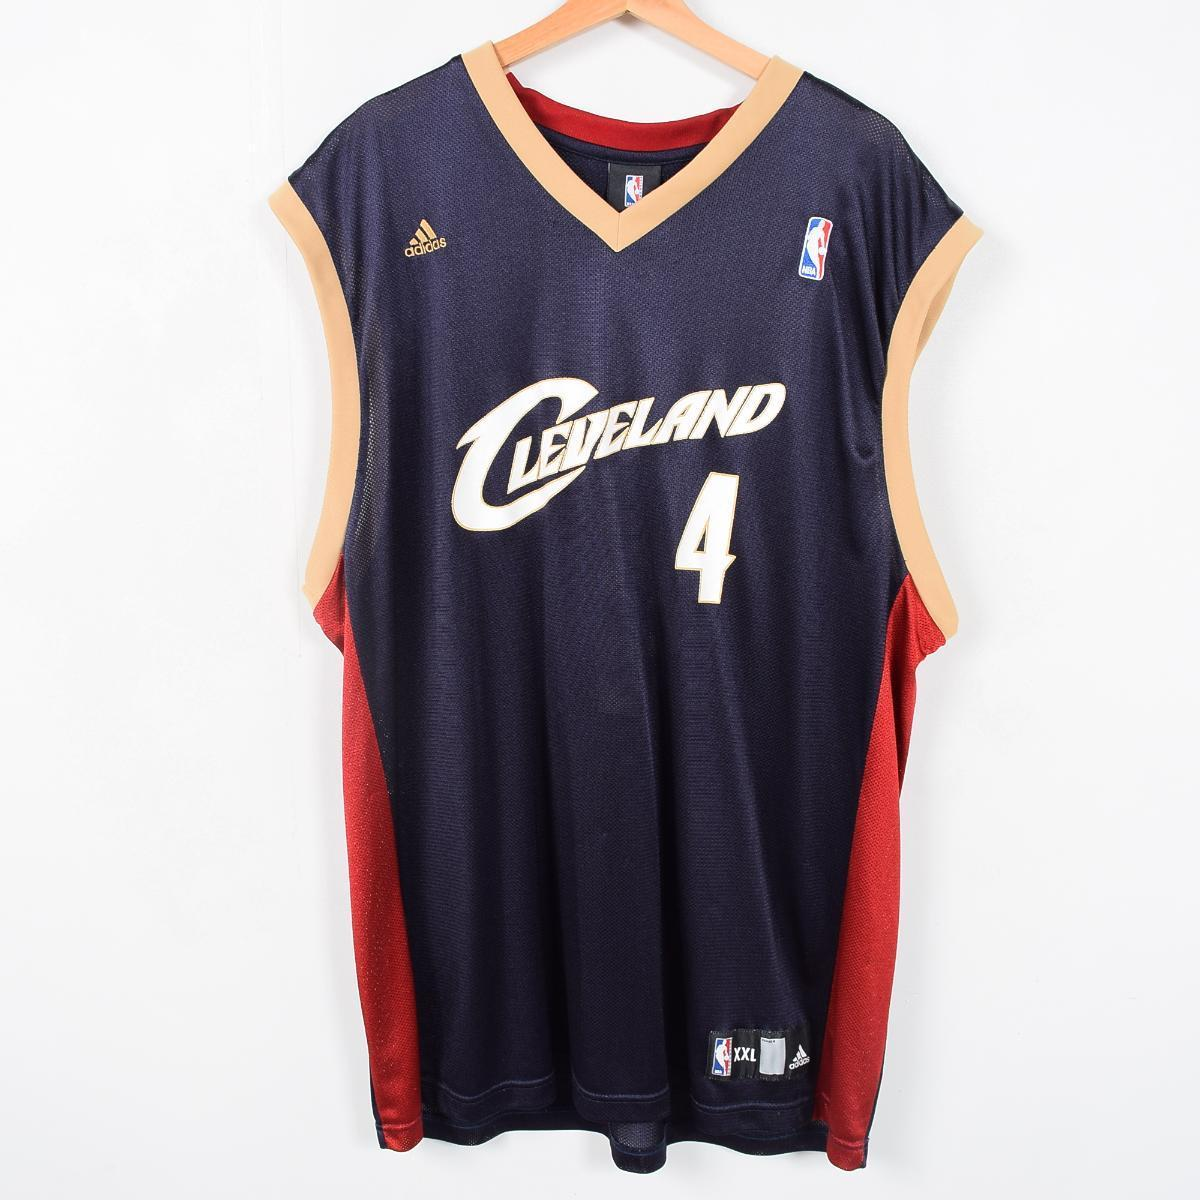 sports shoes 16867 53602 Adidas NBA CLEVELAND CAVALIERS Cleveland Cavaliers RASHEED ABUAL WALLACE  game shirt replica uniform men XXL adidas /wag2616